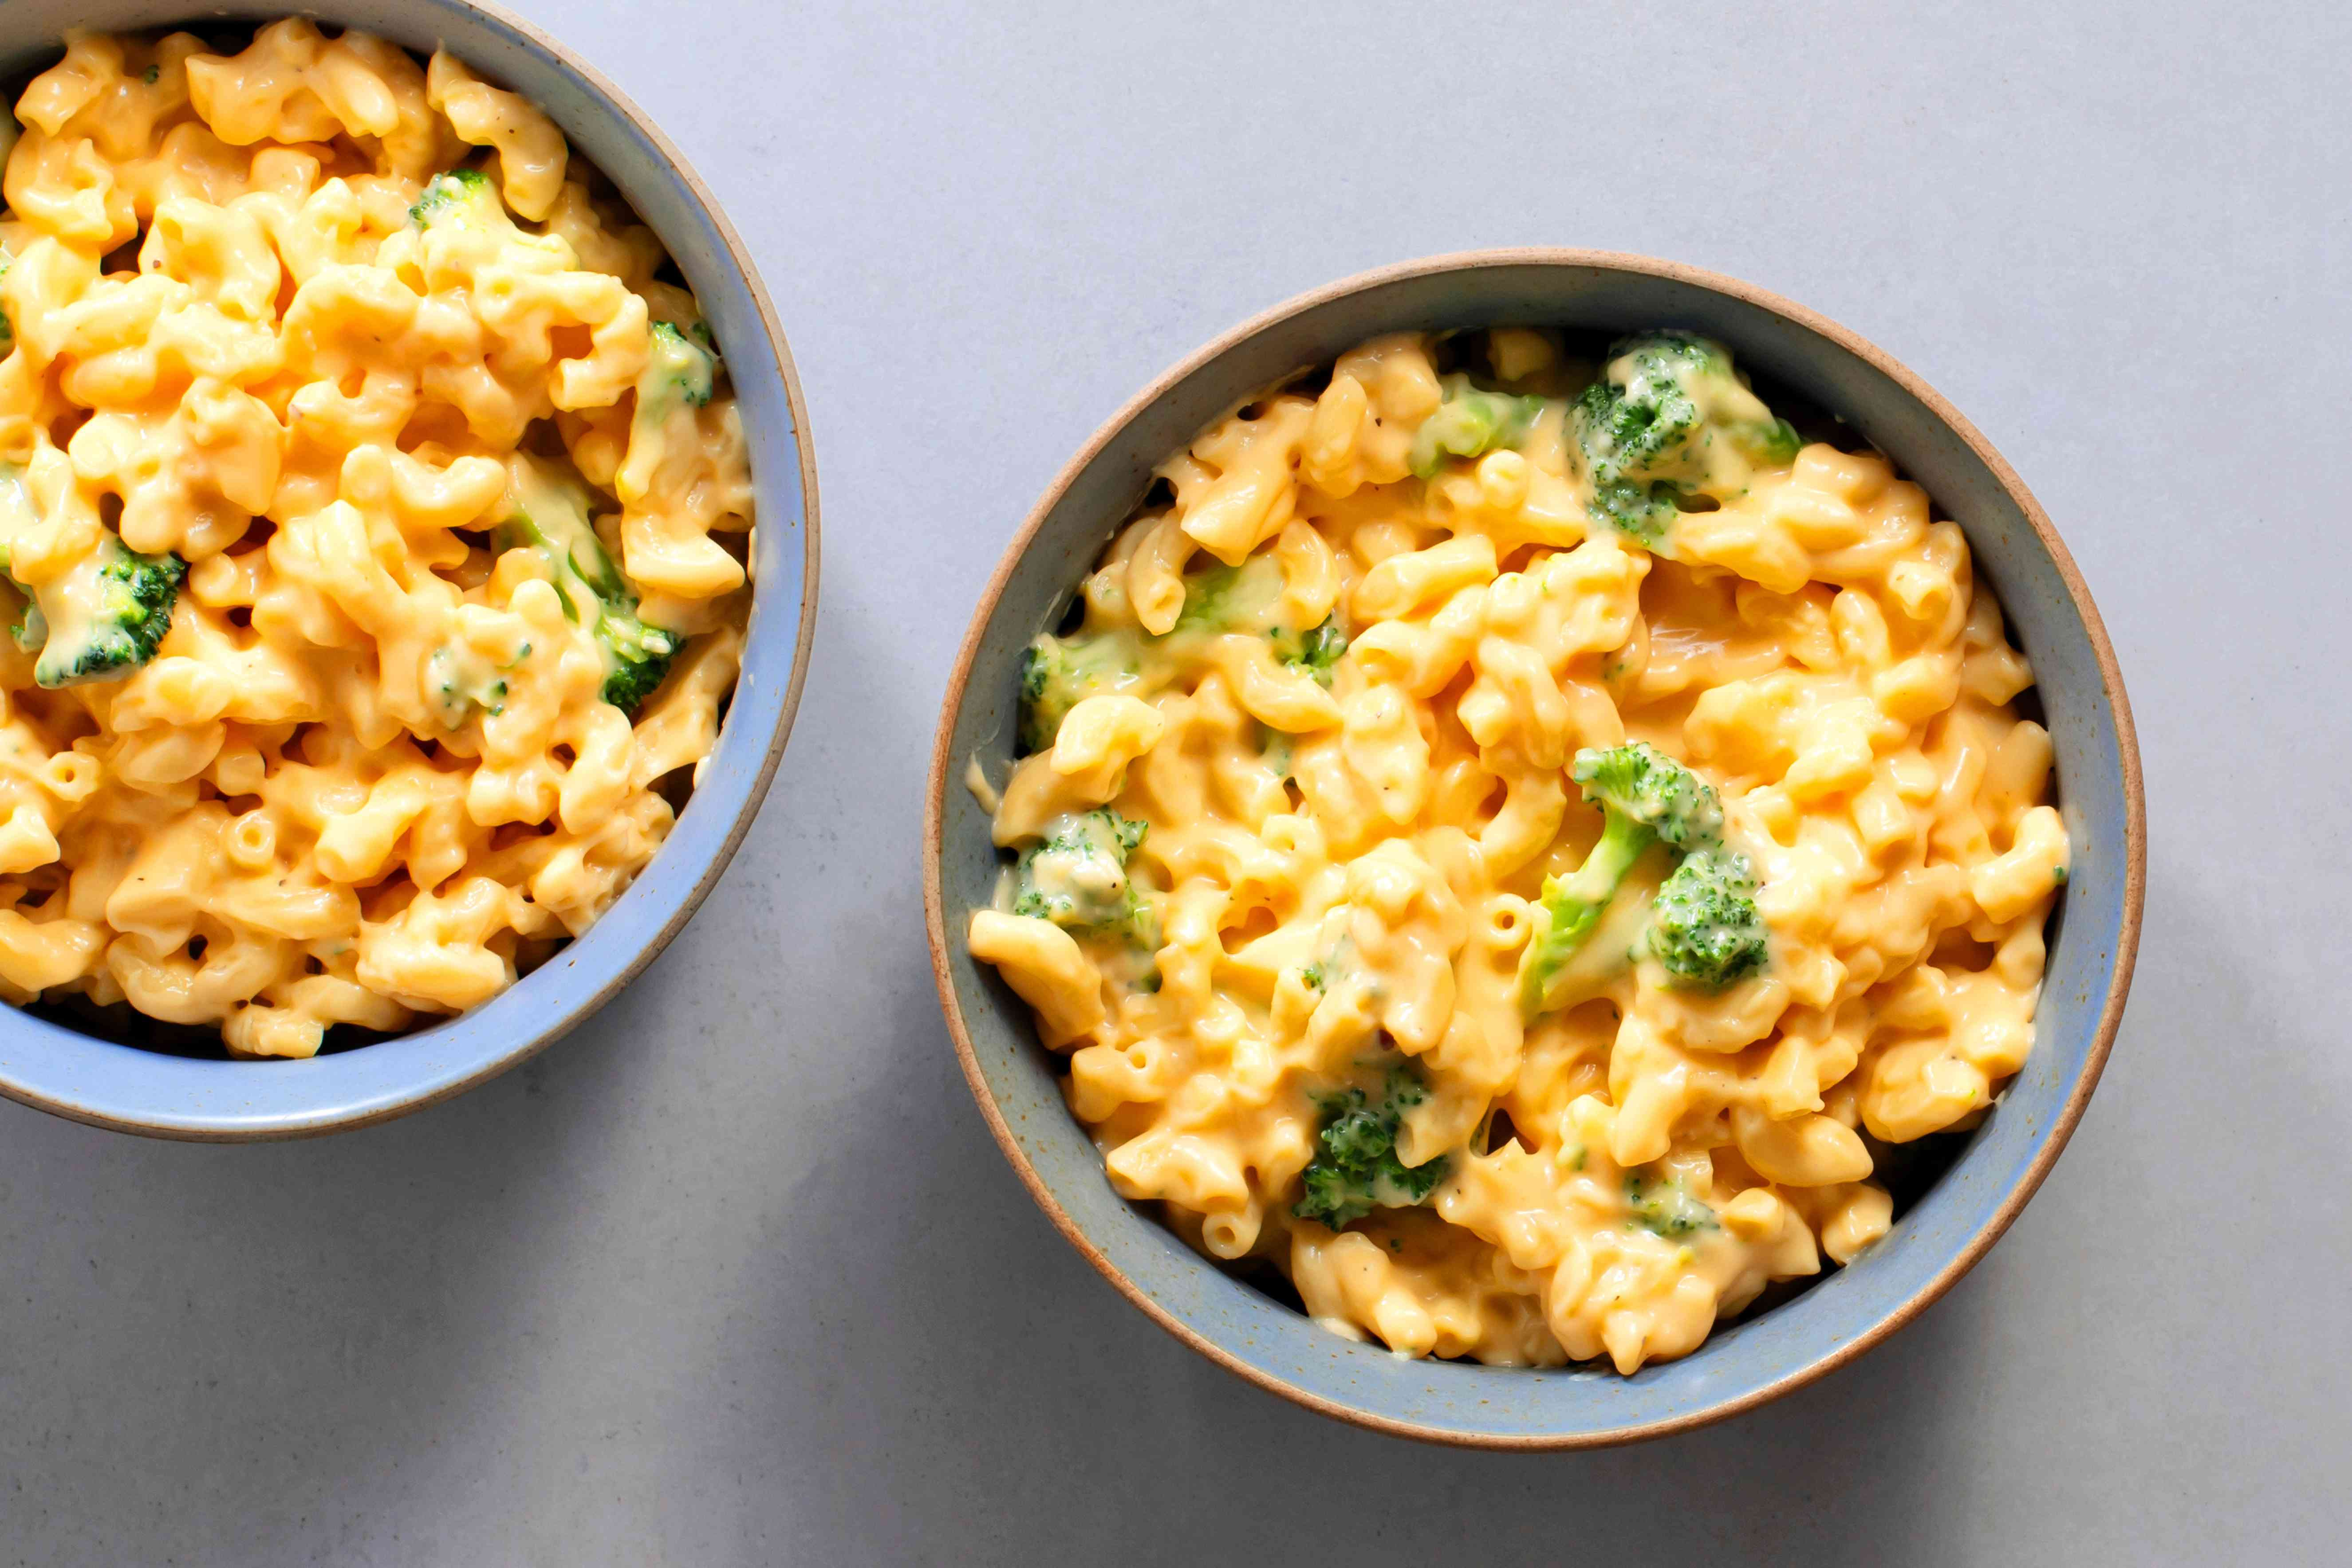 Easy One-Pan Broccoli Macaroni and Cheese